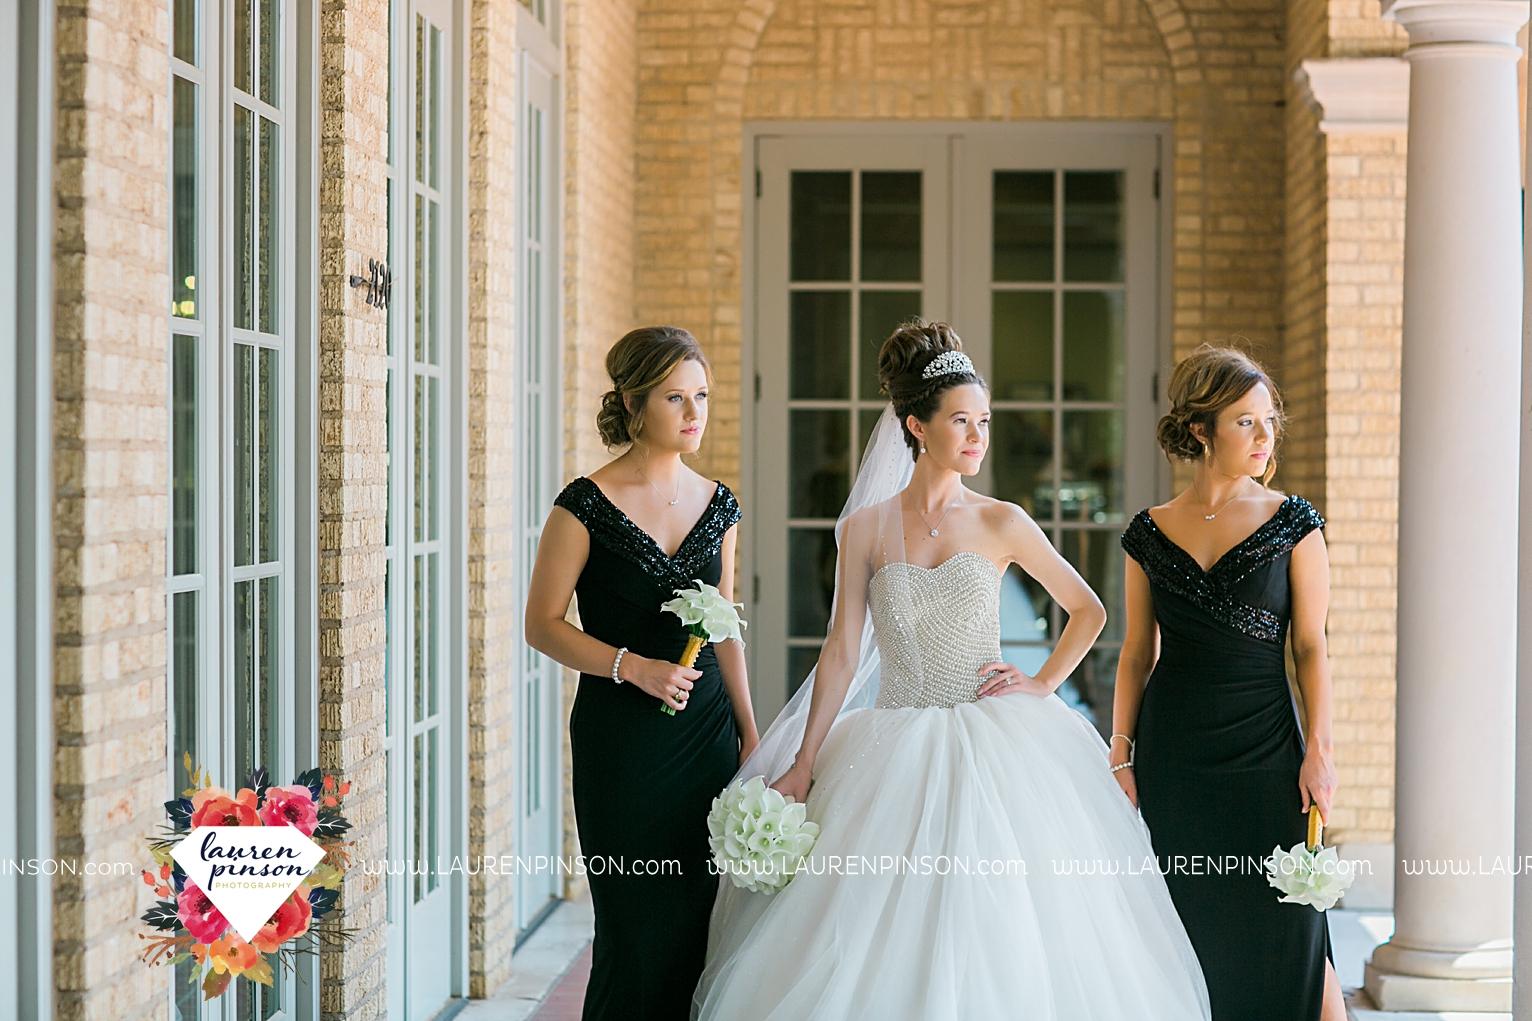 wichita-falls-texas-wedding-photographer-the-forum-by-the-kemp-mayfield-events-ulta-gold-glitter_2842.jpg